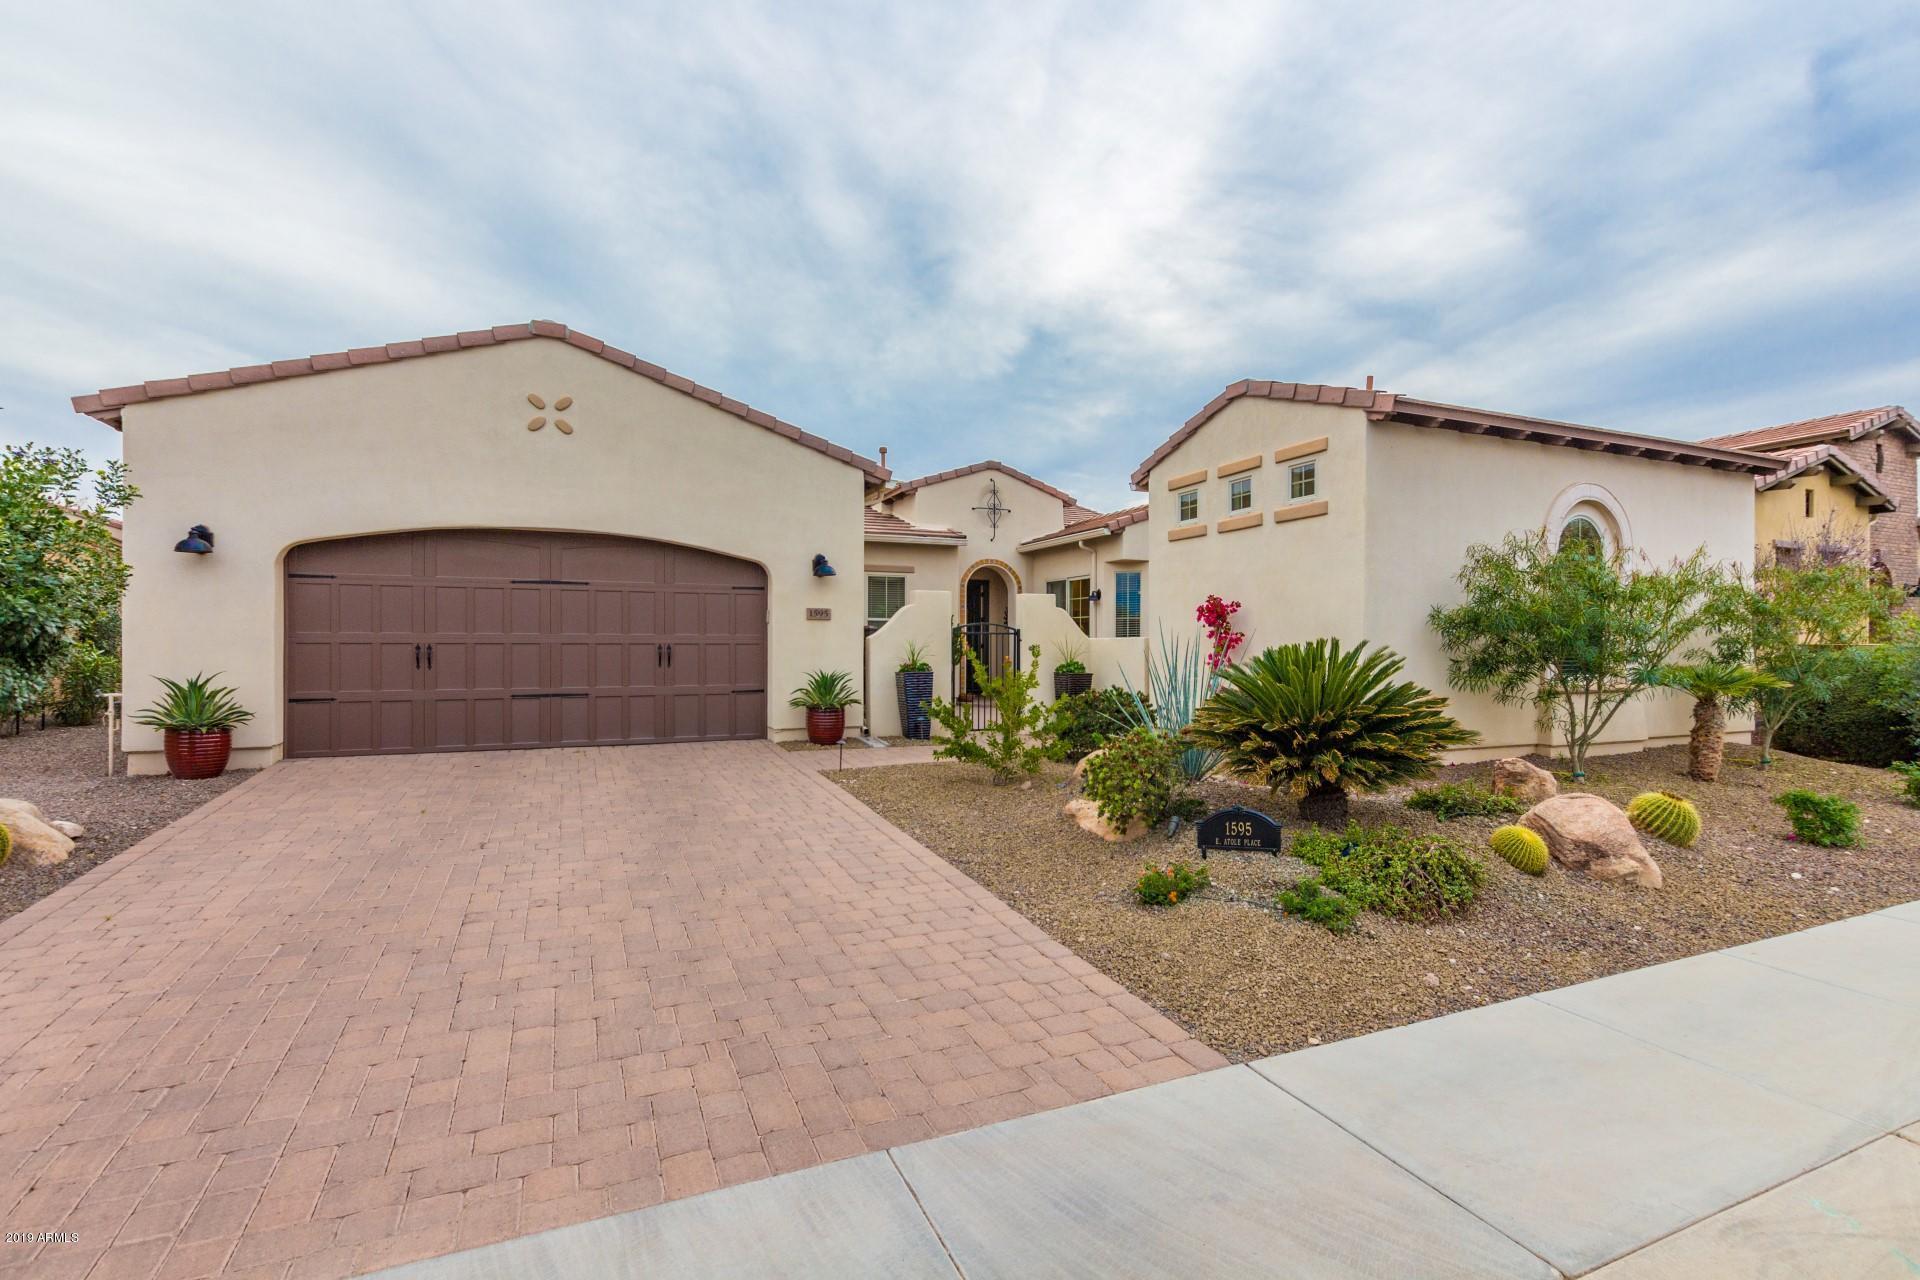 MLS 5893938 1595 E ATOLE Place, San Tan Valley, AZ 85140 San Tan Valley AZ Eco-Friendly